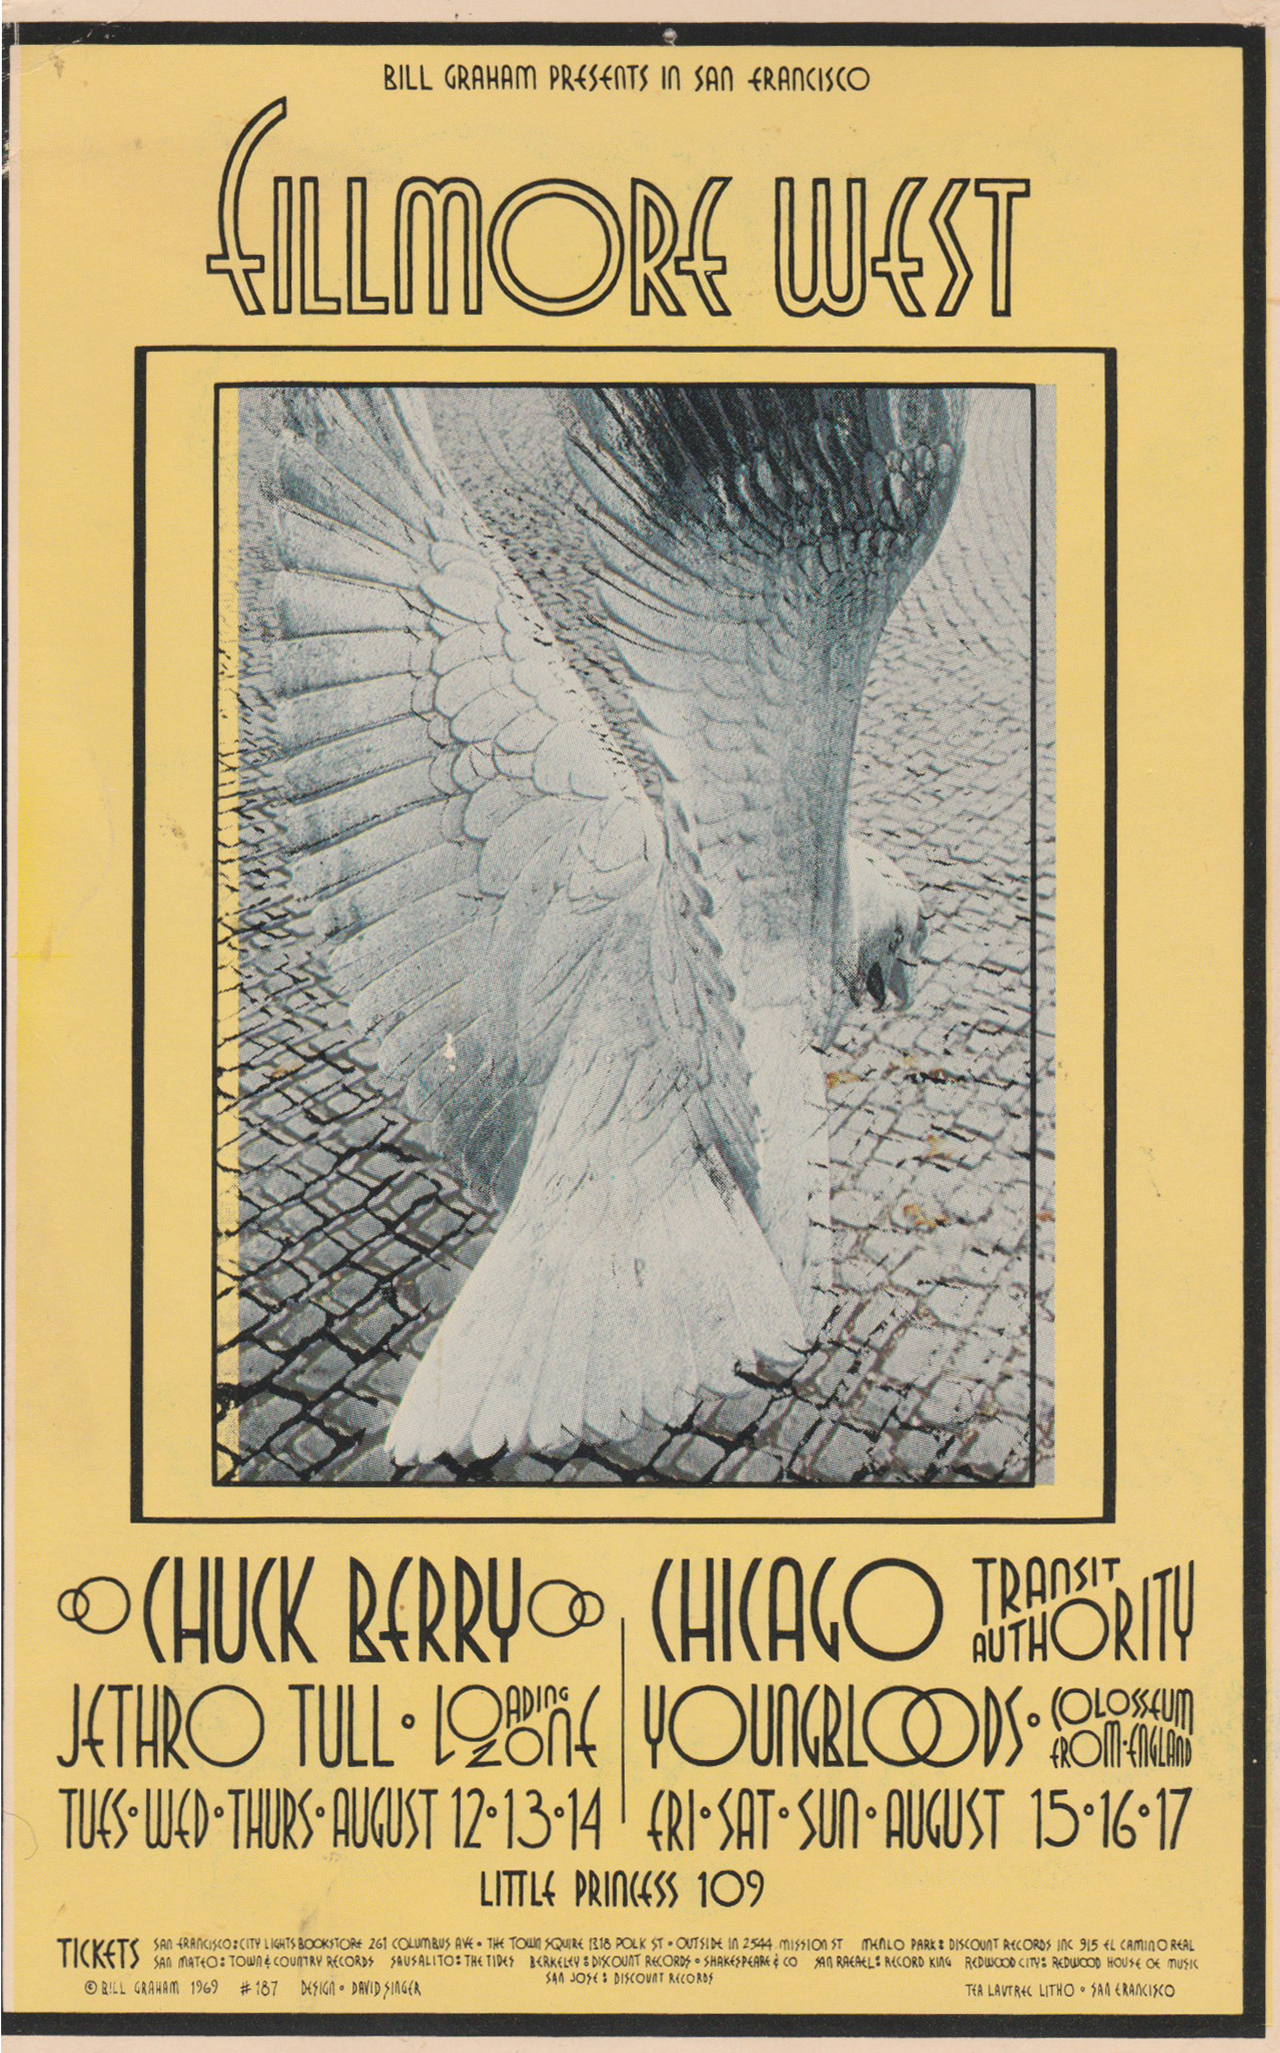 Chuck BerryHandbill